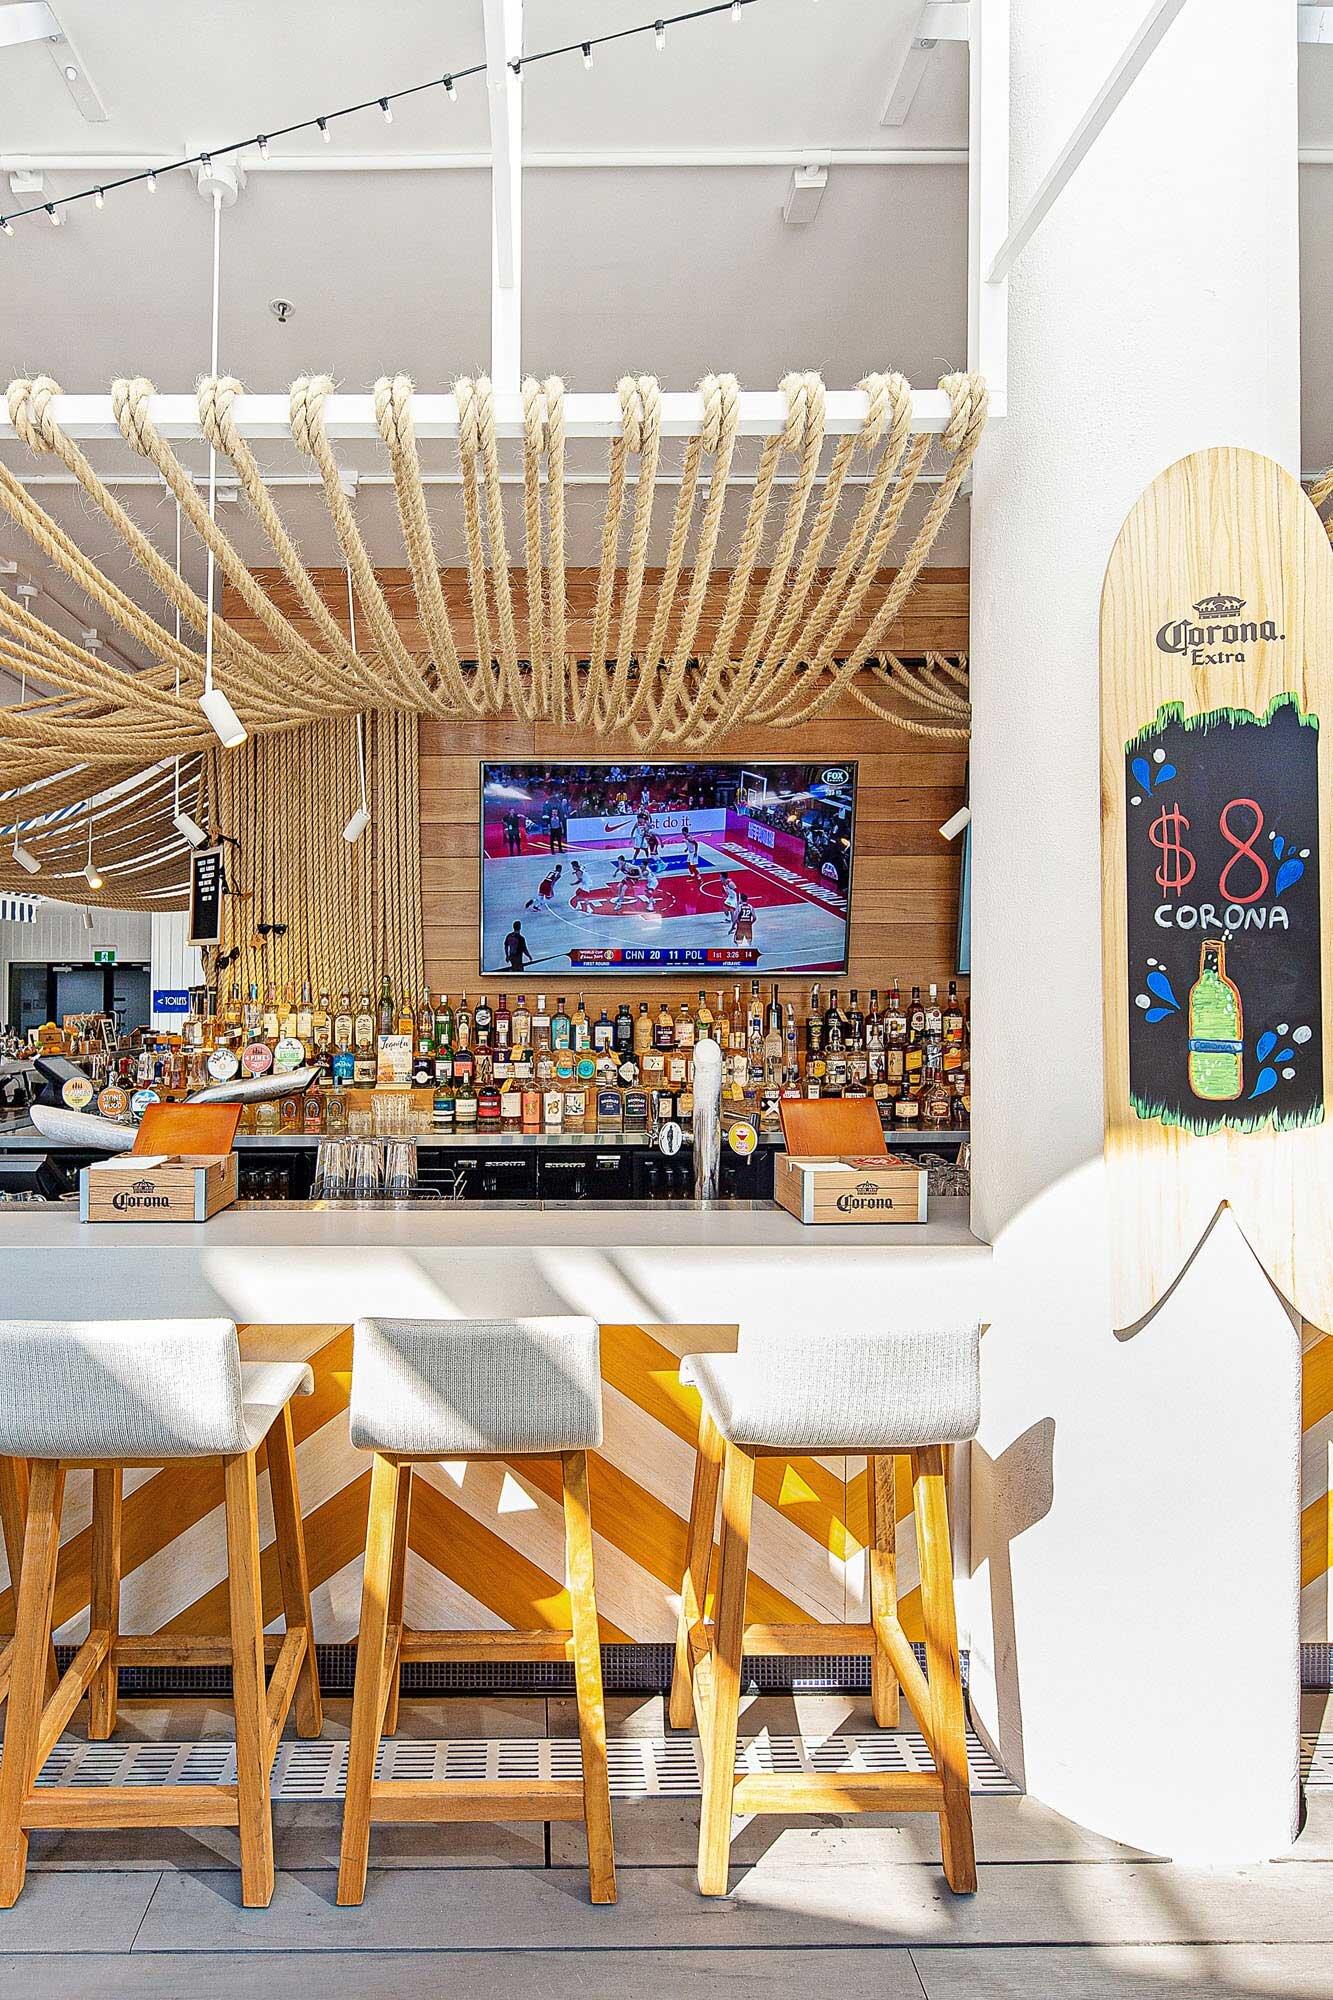 Surfers-Paradise-Beer-Garden-Pub-Architecture-4.jpg